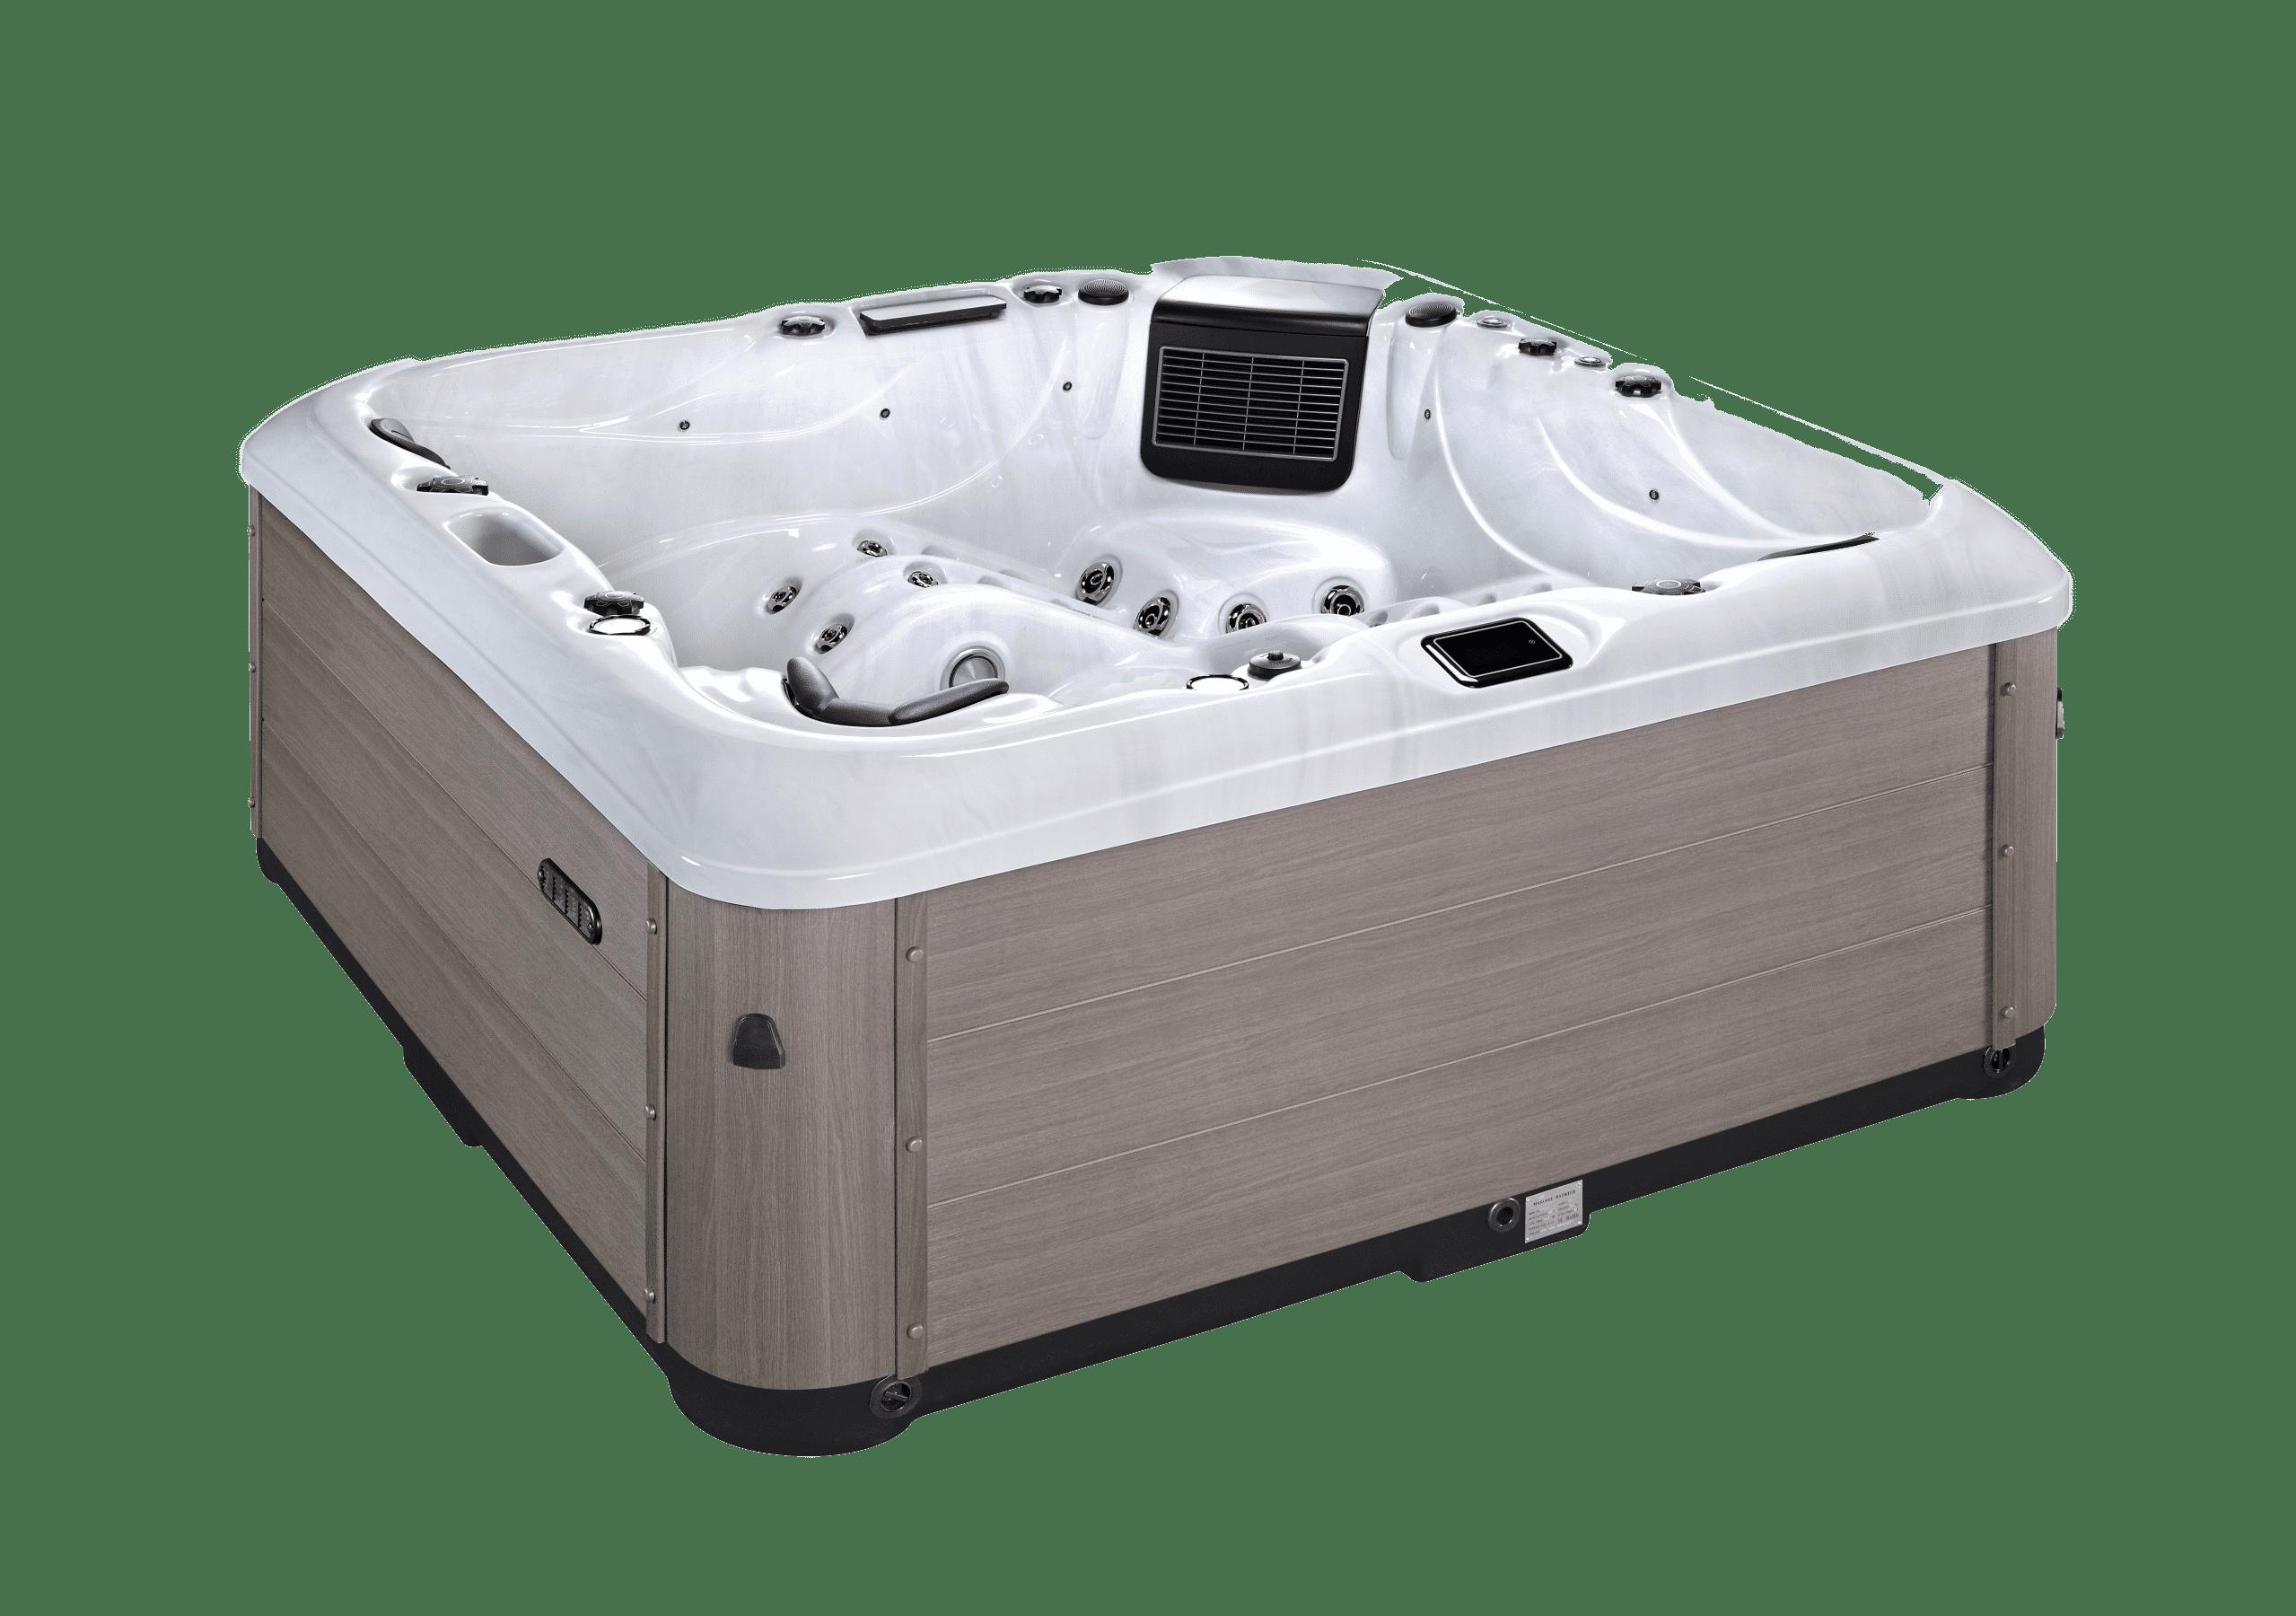 hot tub image